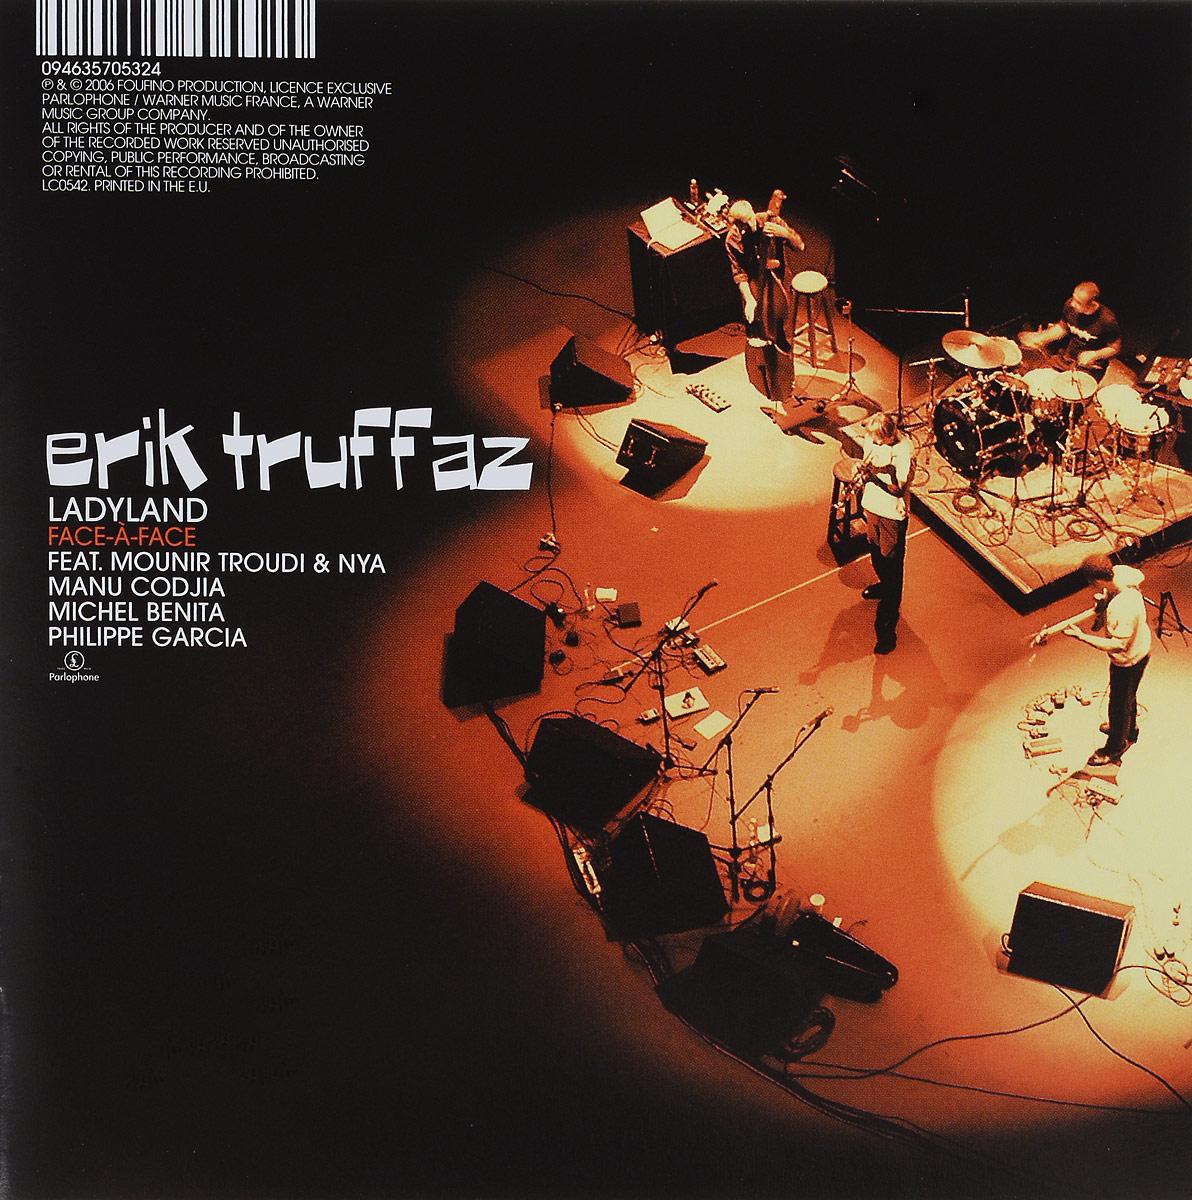 Erik Truffaz. Face-a-Face (2 CD)